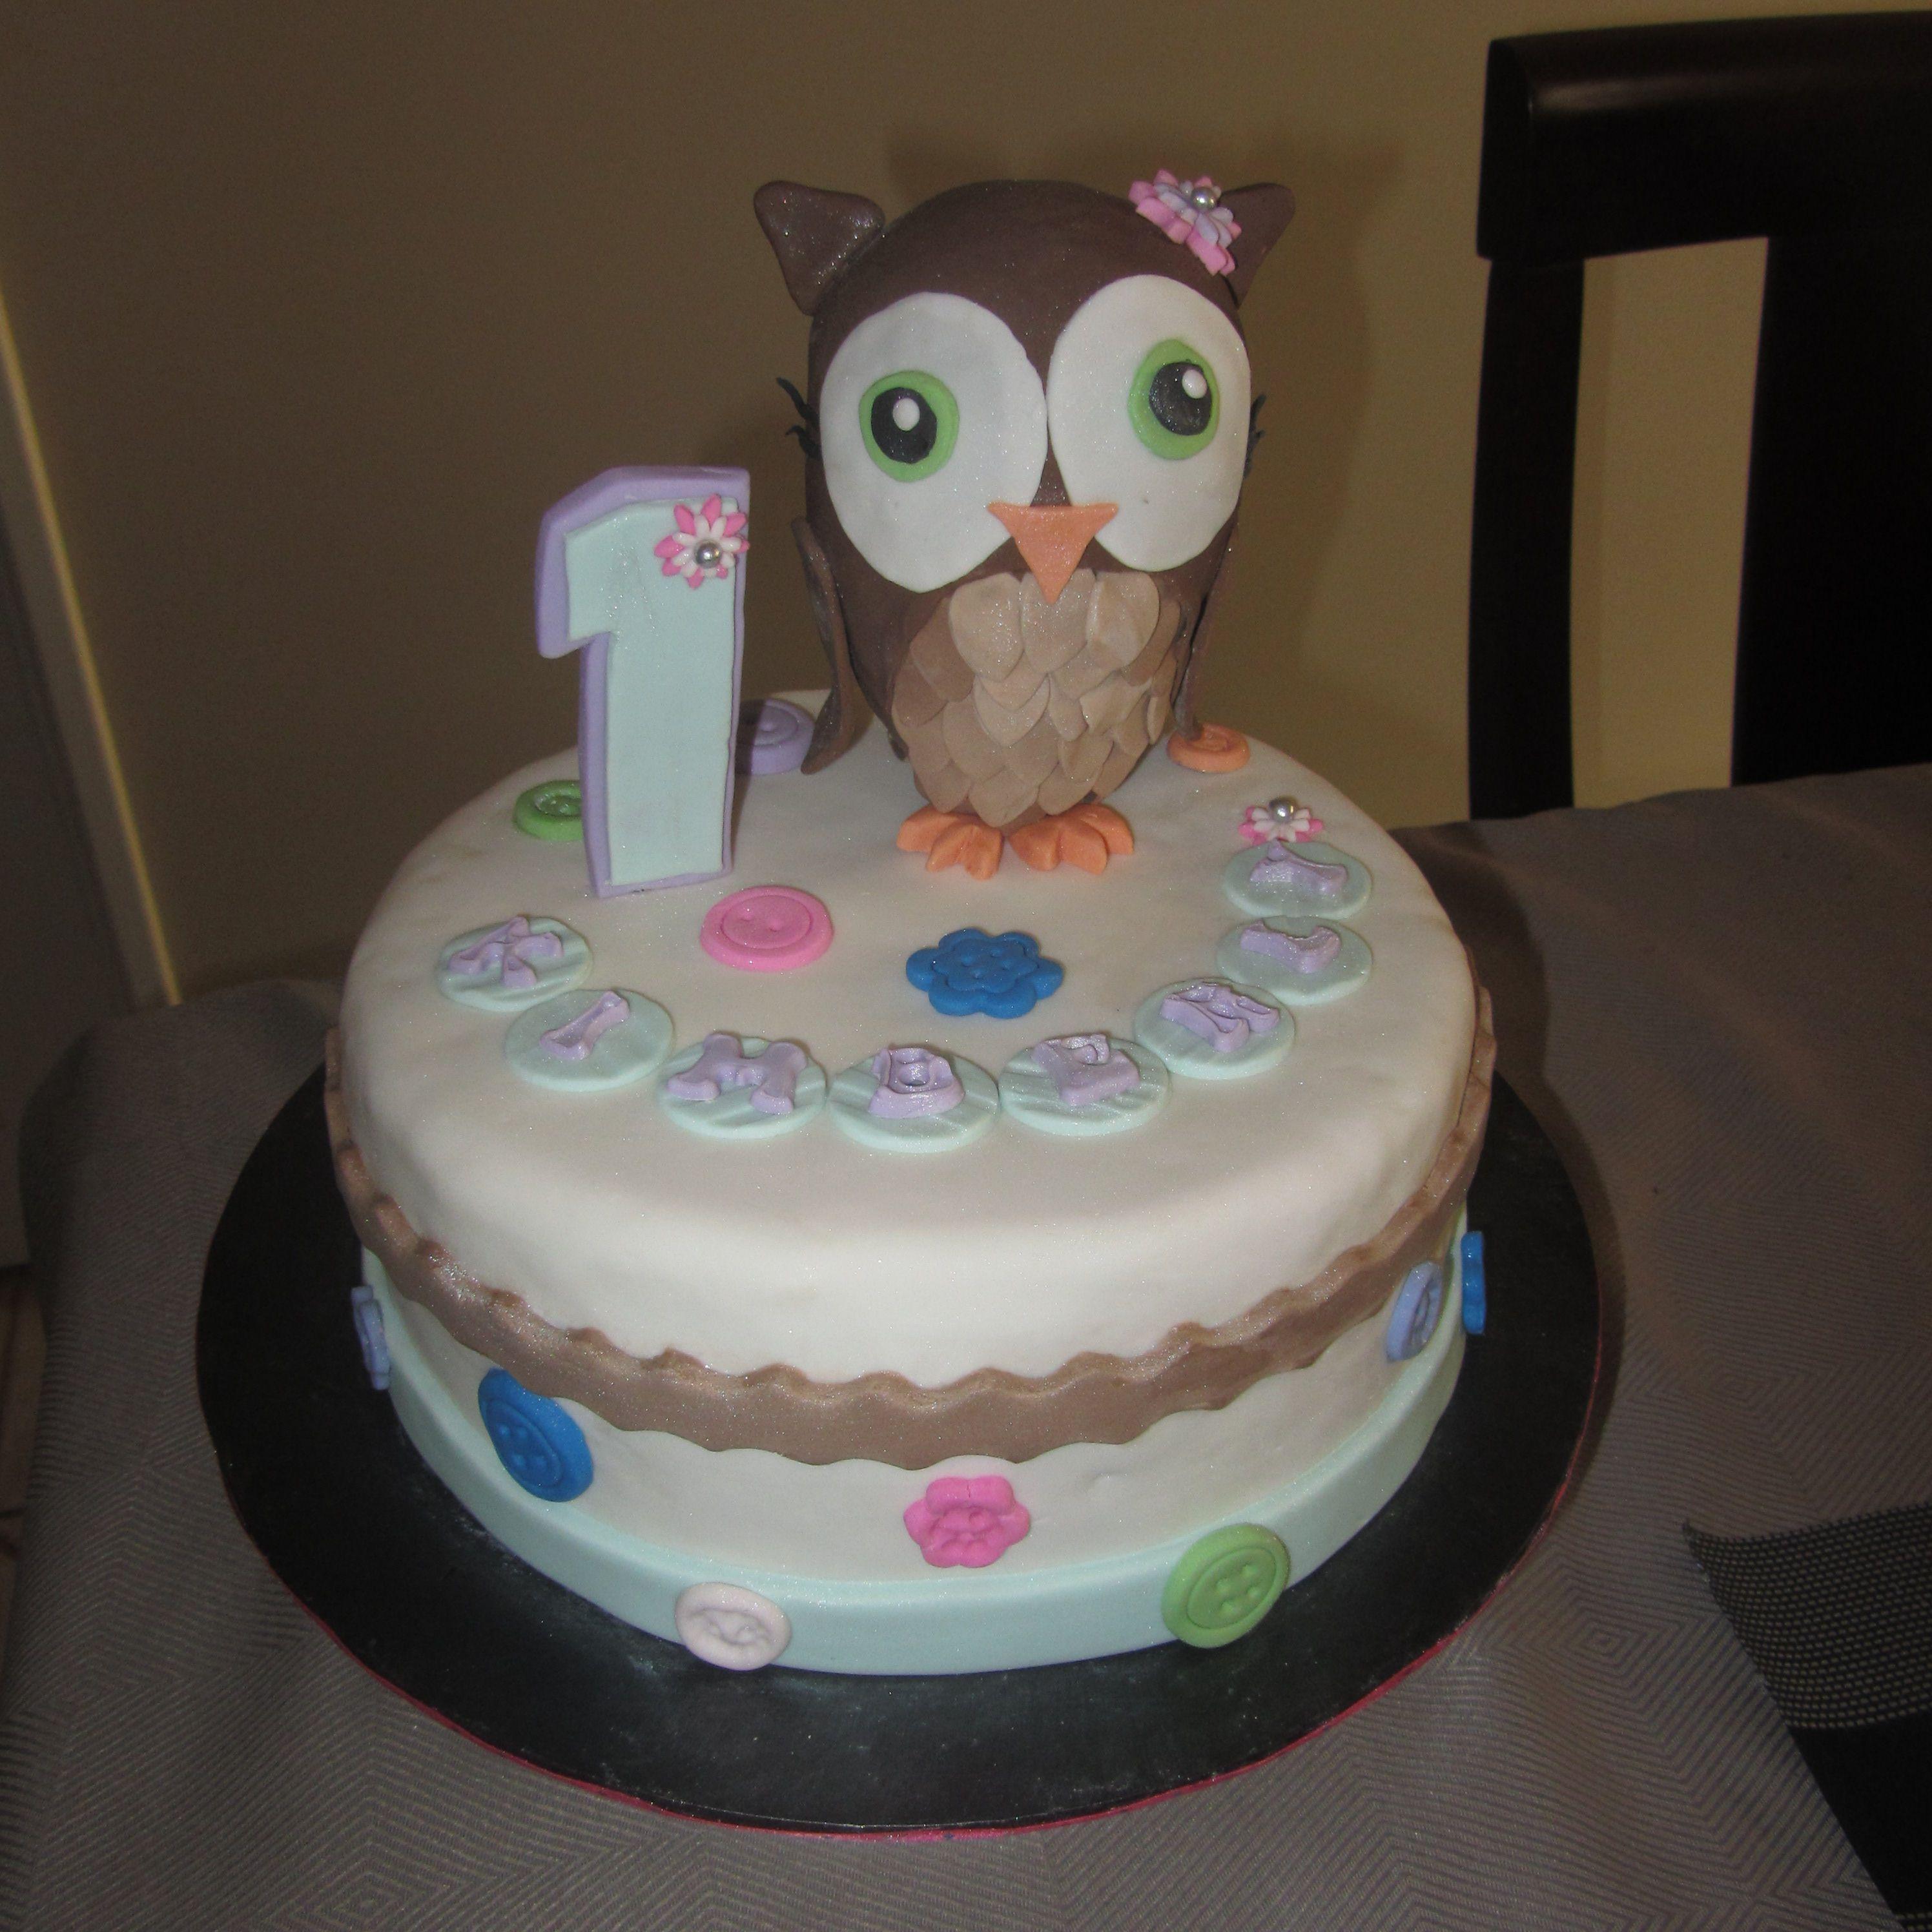 1st birthday owl cake december 2013 cake decorating for Decorating 1st birthday cake